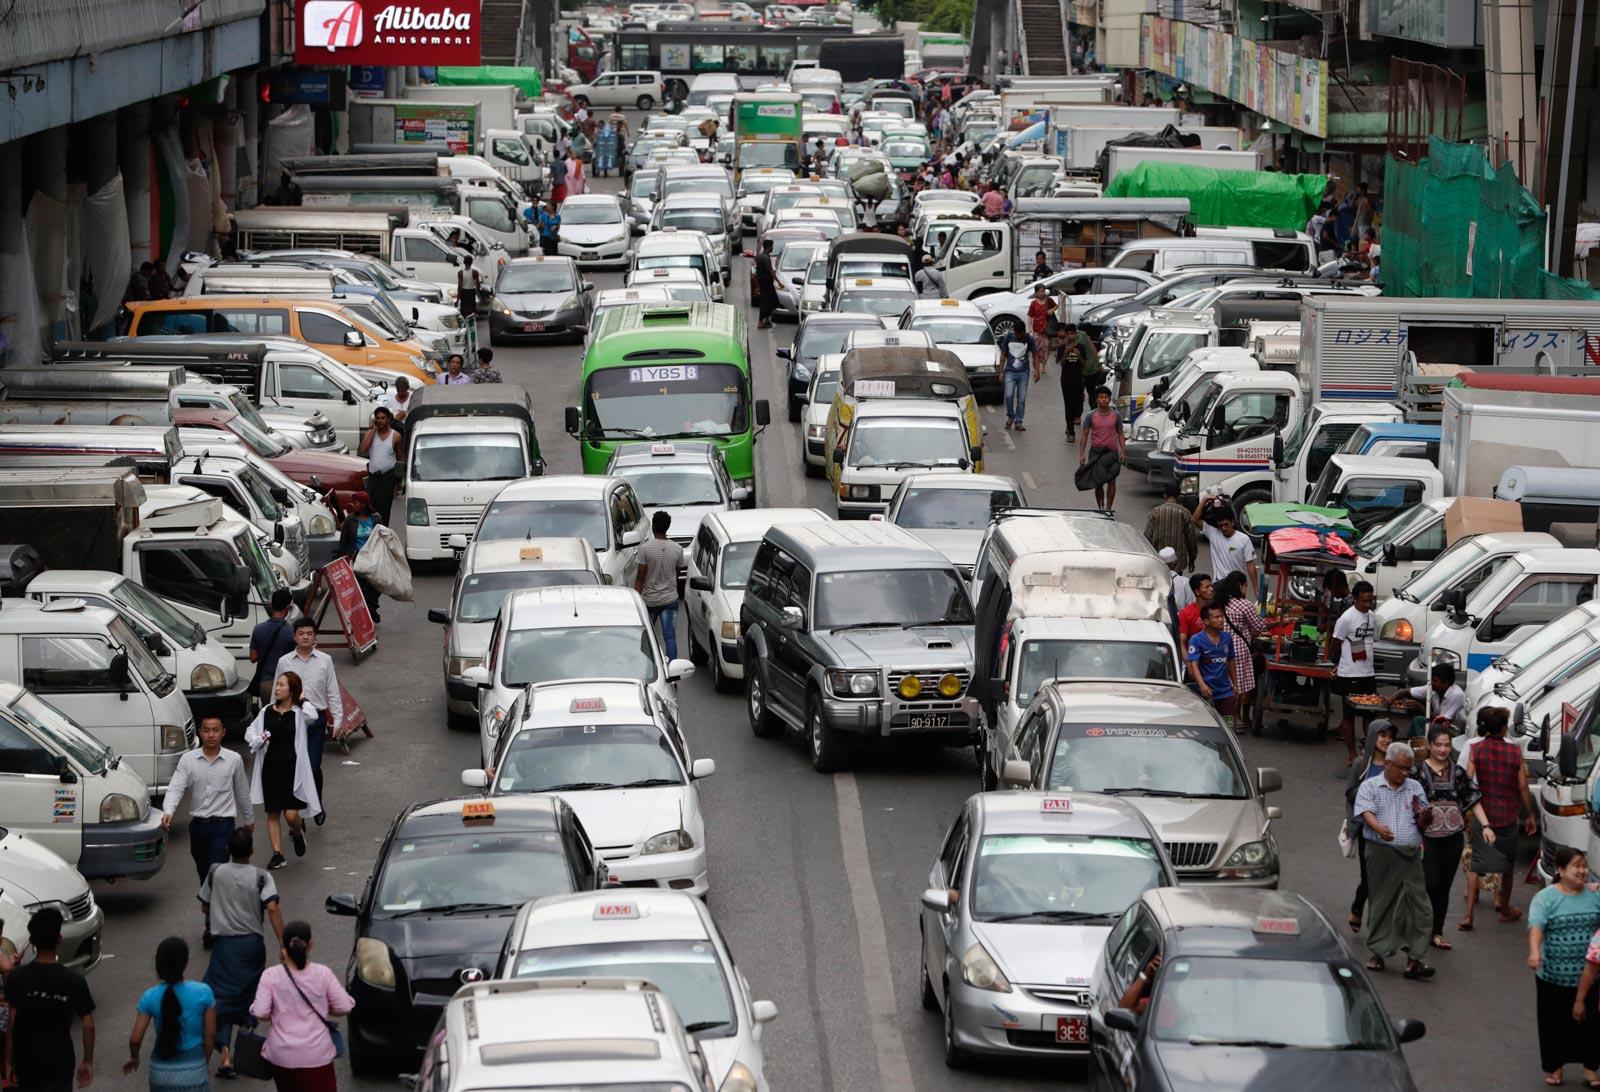 Traffic jam in downtown Yangon, May 2019. Photo: EPA/Lynn Bo Bo